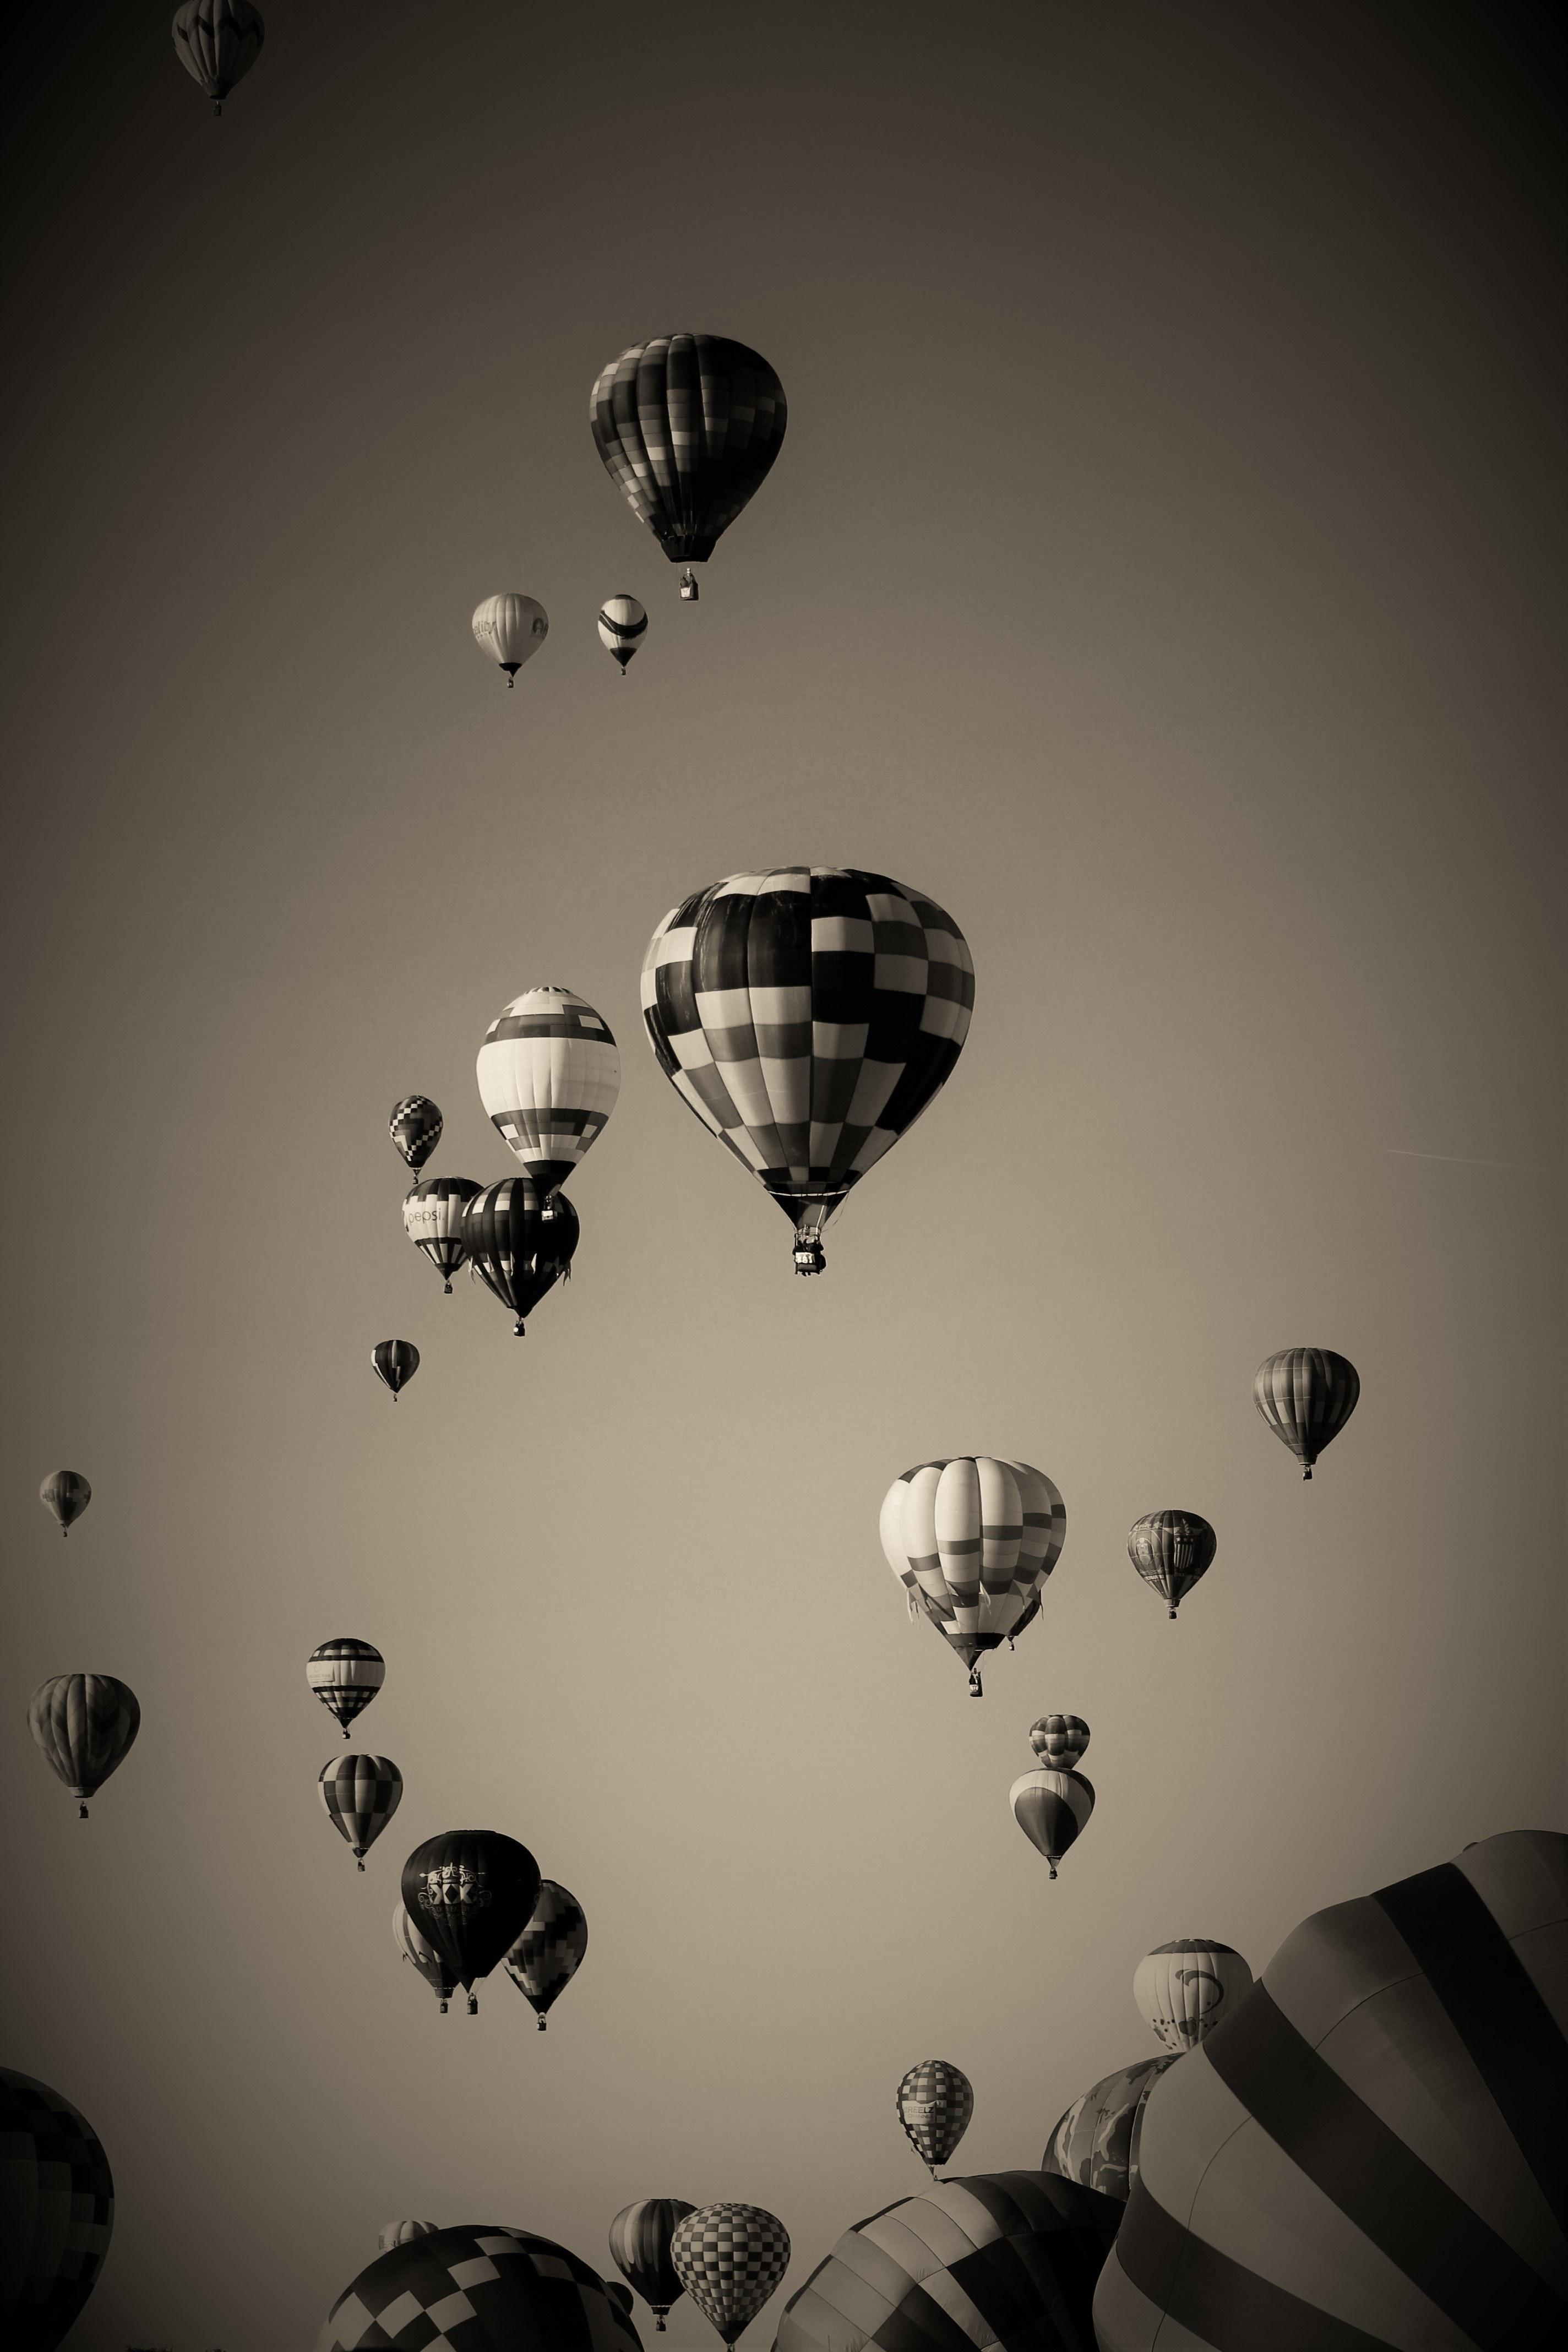 Ballon At Night 183 Free Stock Photo